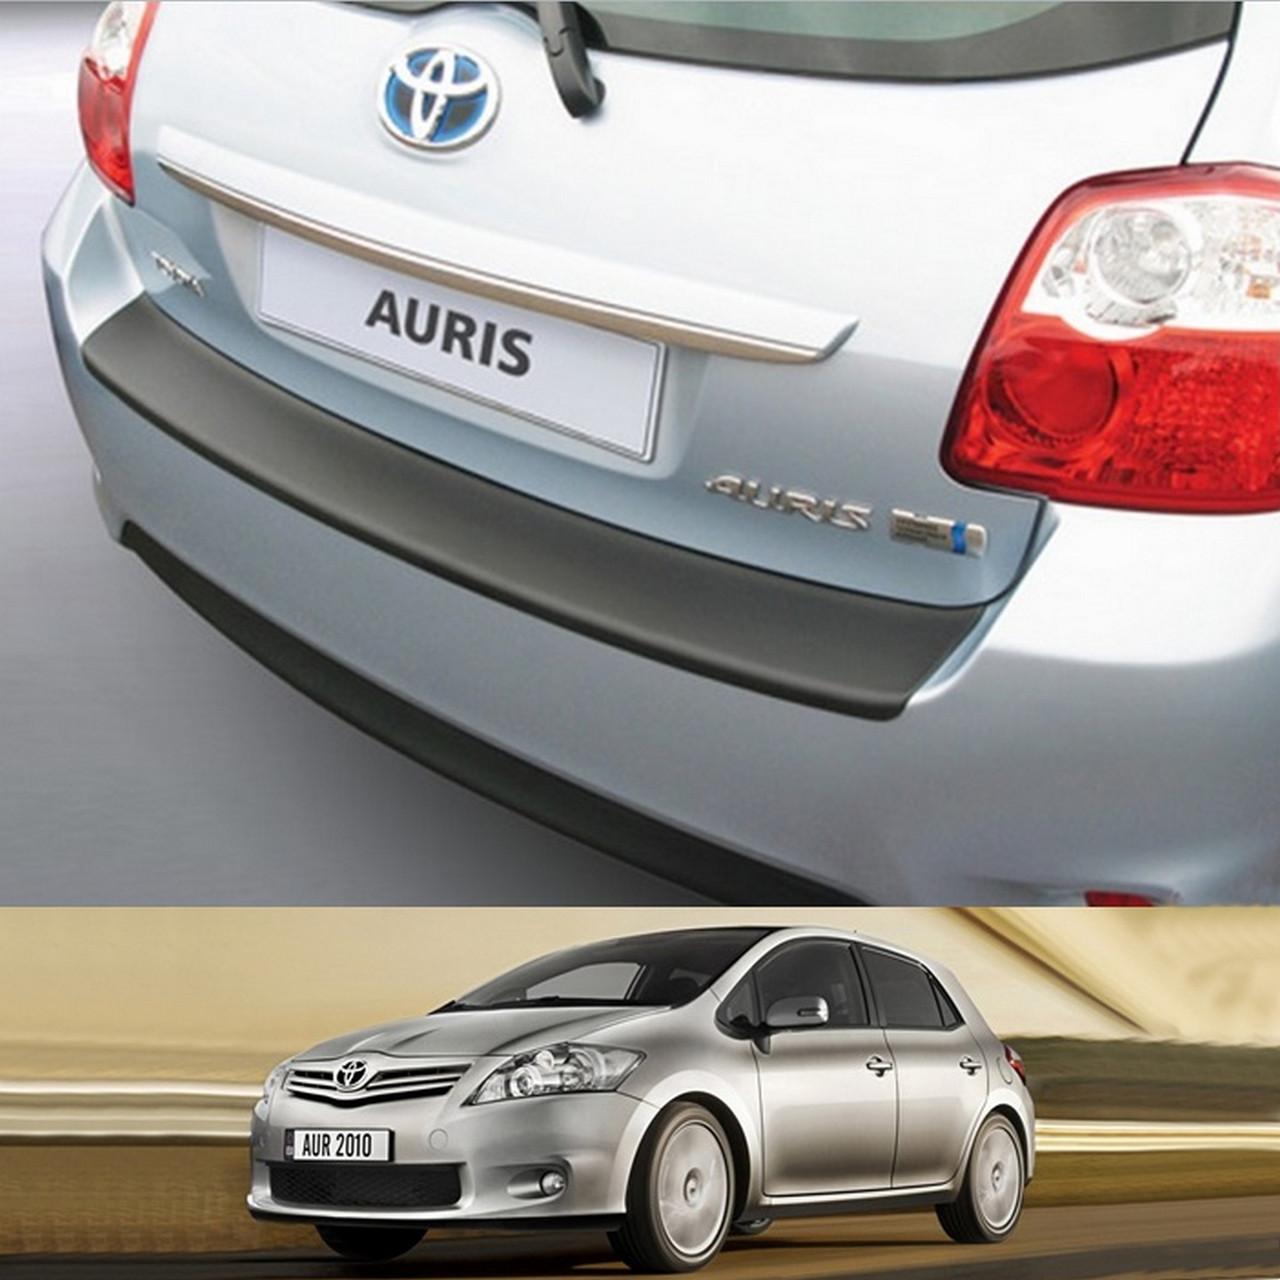 Пластиковая защитная накладка на задний бампер для Toyota Auris 3/5dr 2010-2012